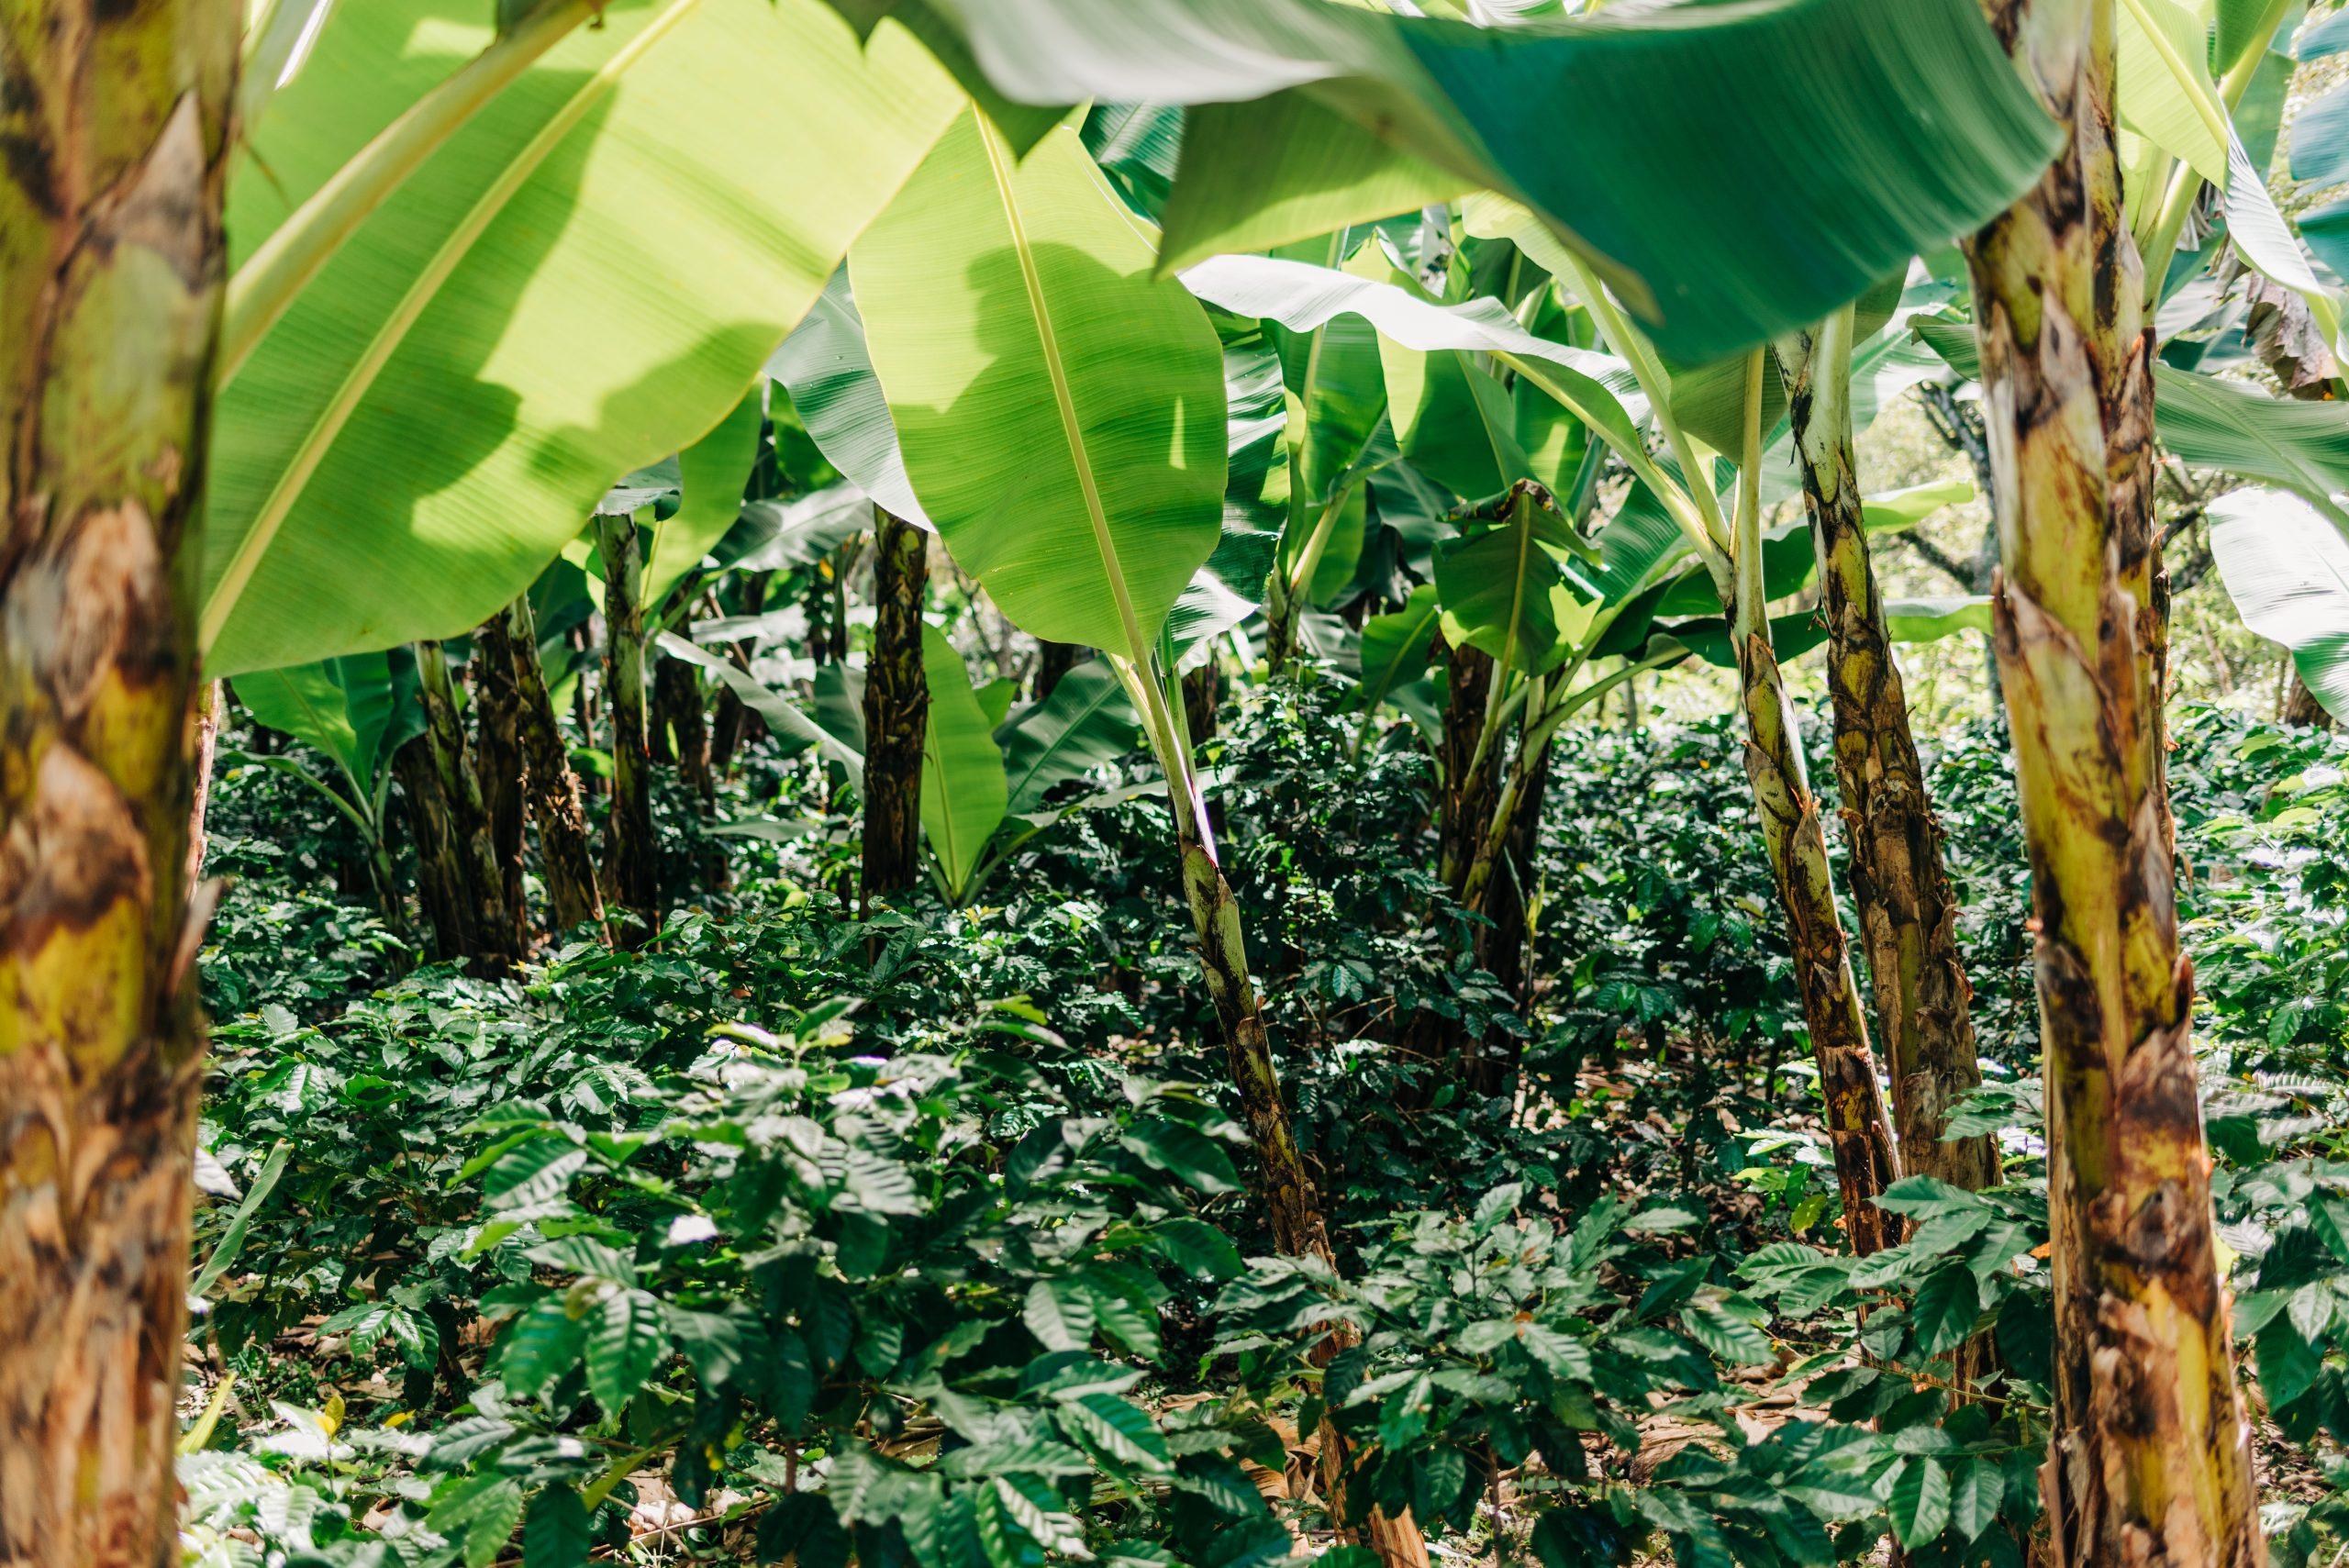 Coffee trees grow under the shade of banana trees in Honduras.